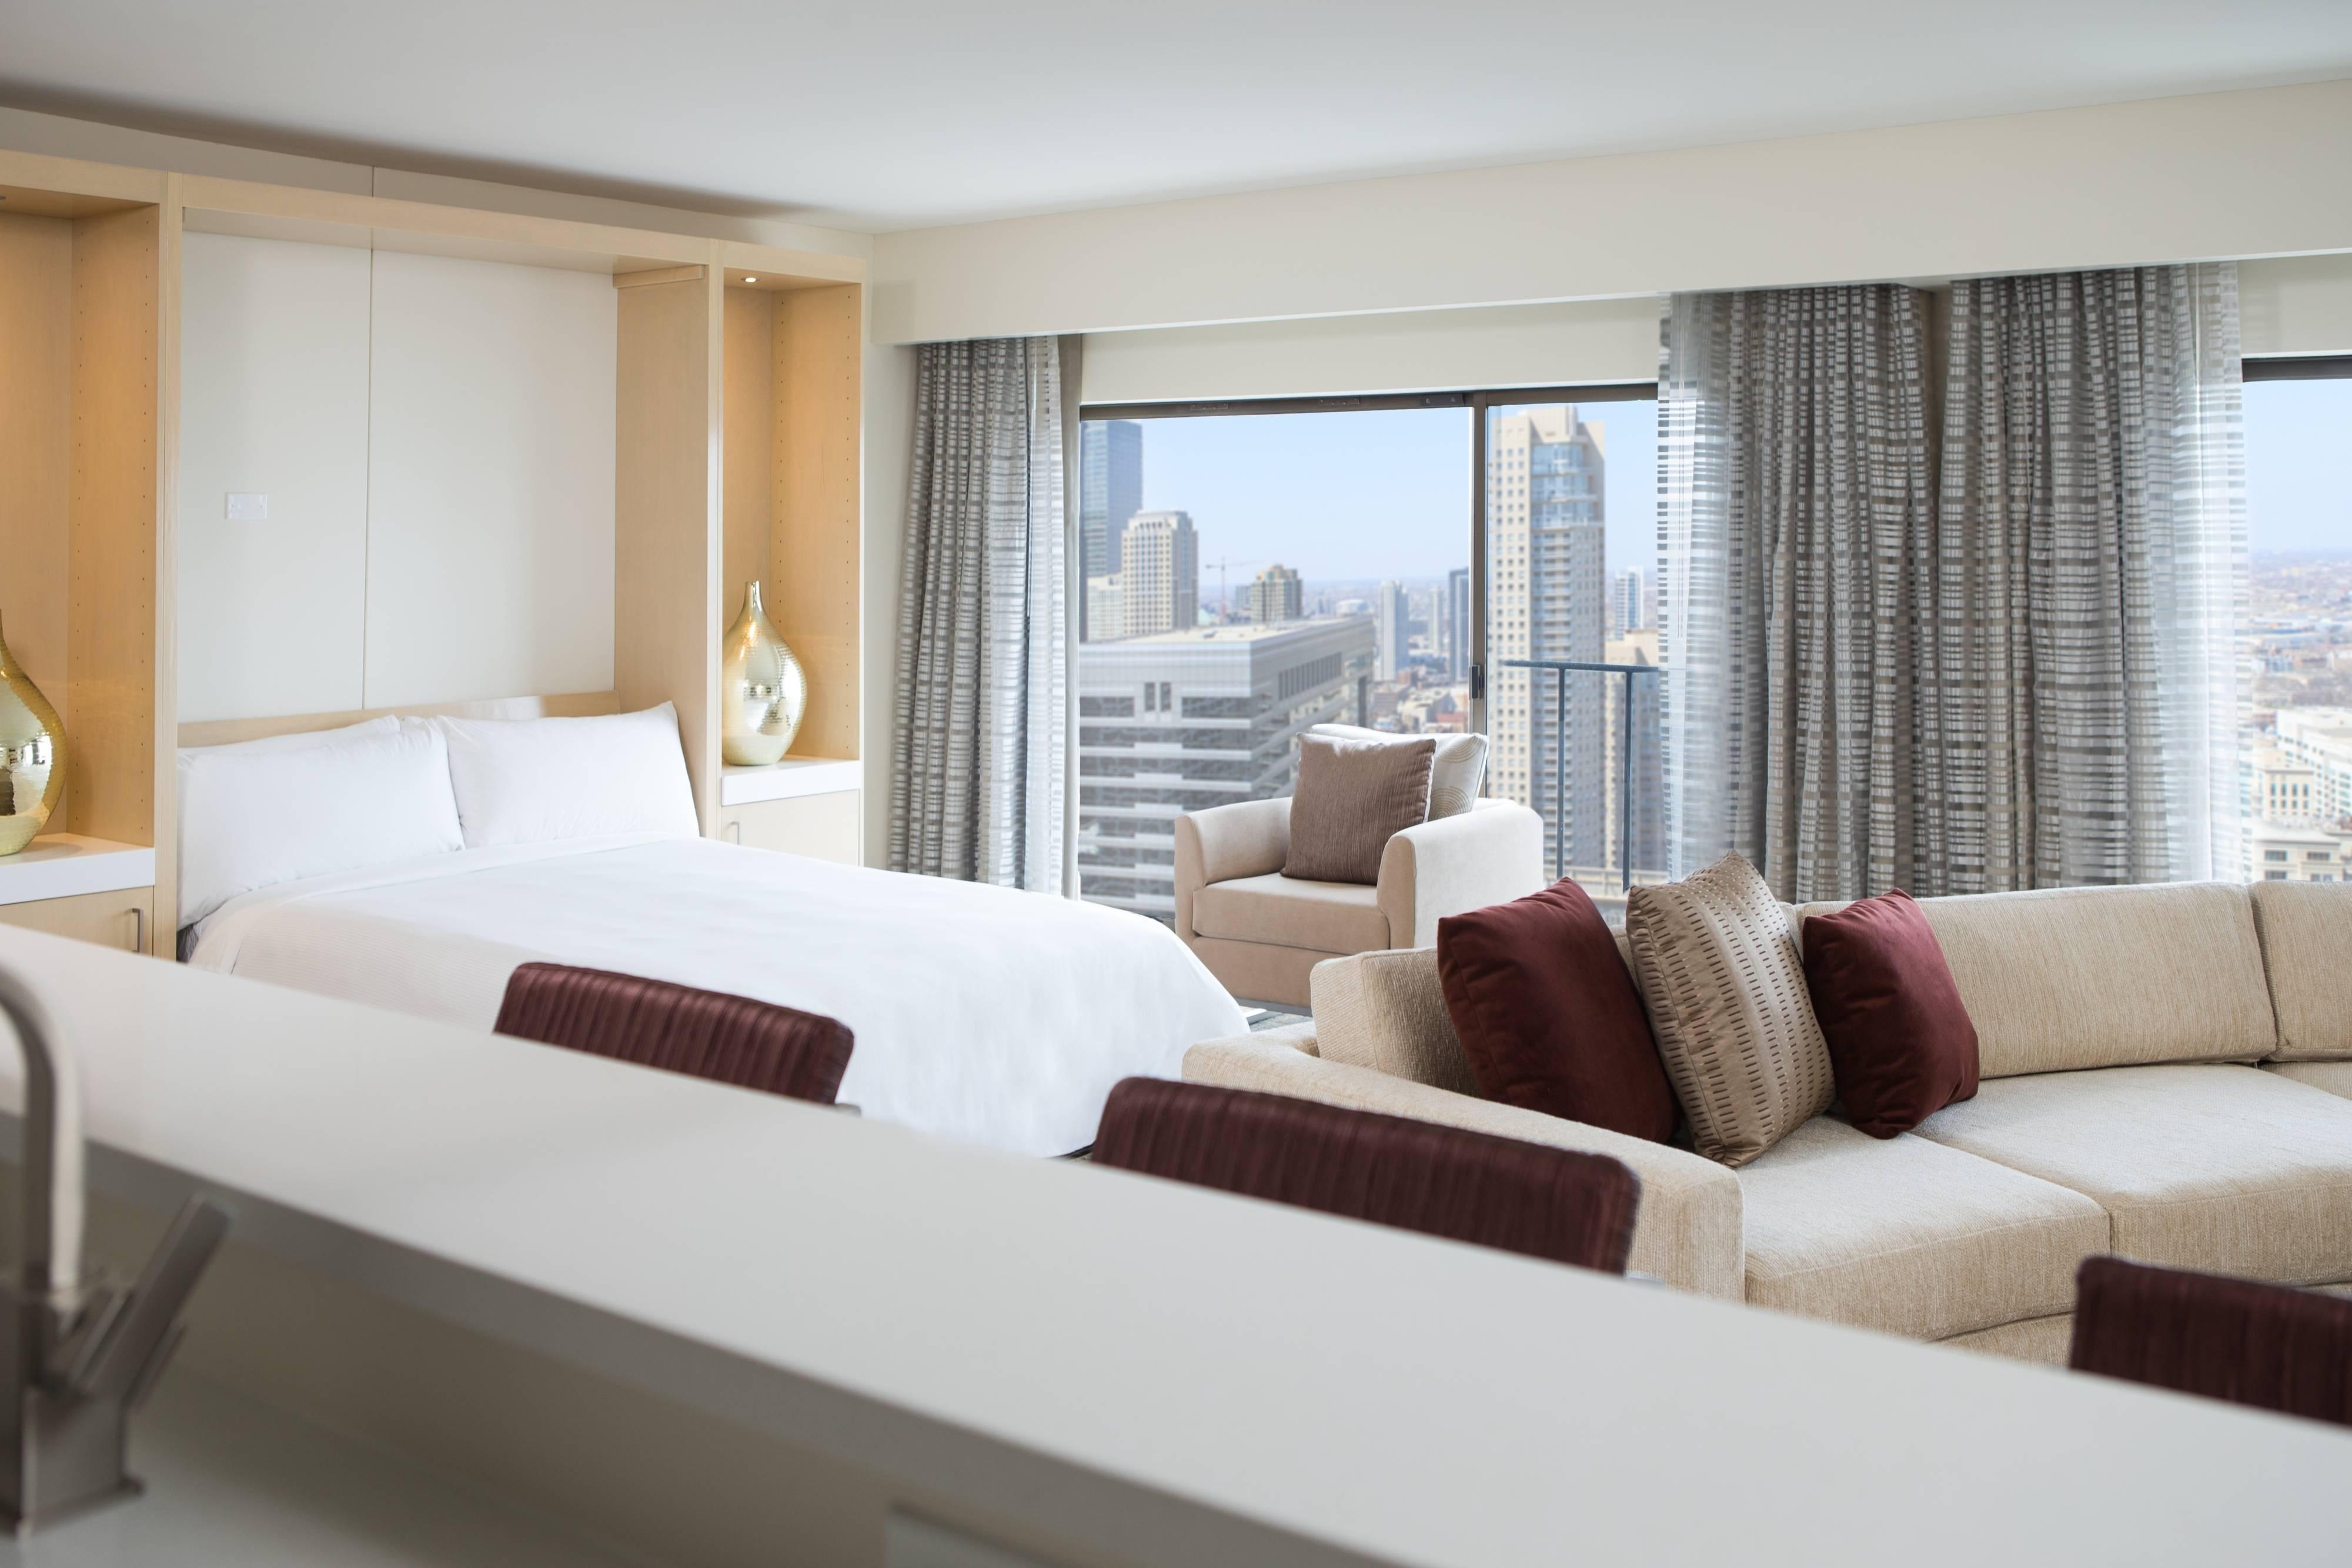 Chicago Hotel Room